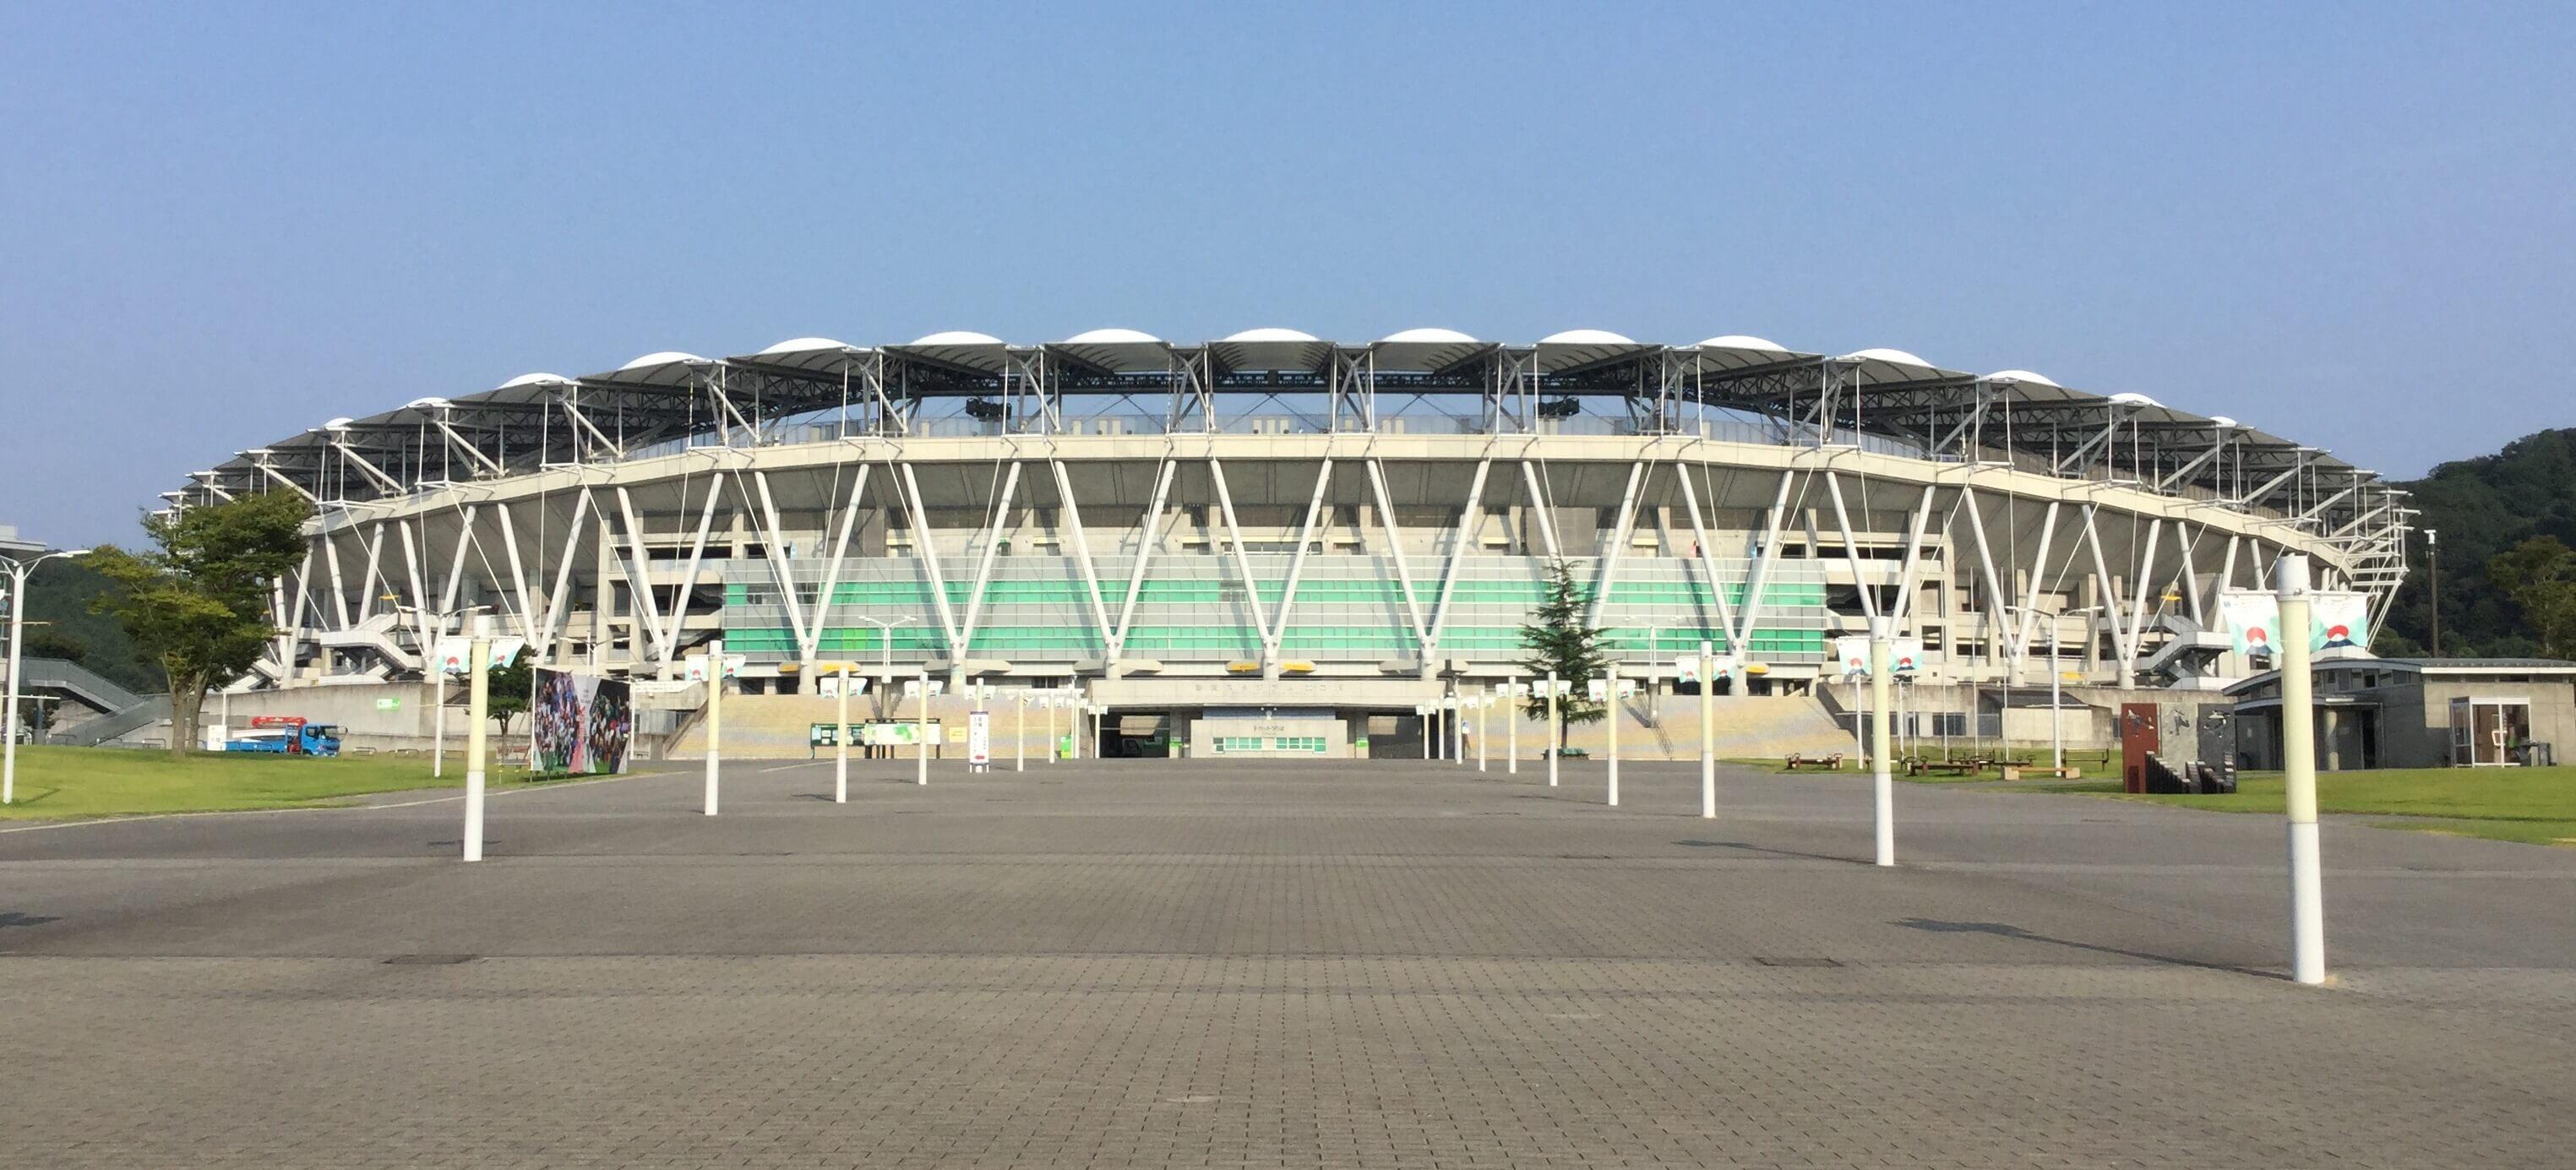 Shizuoka Ecopa Stadium